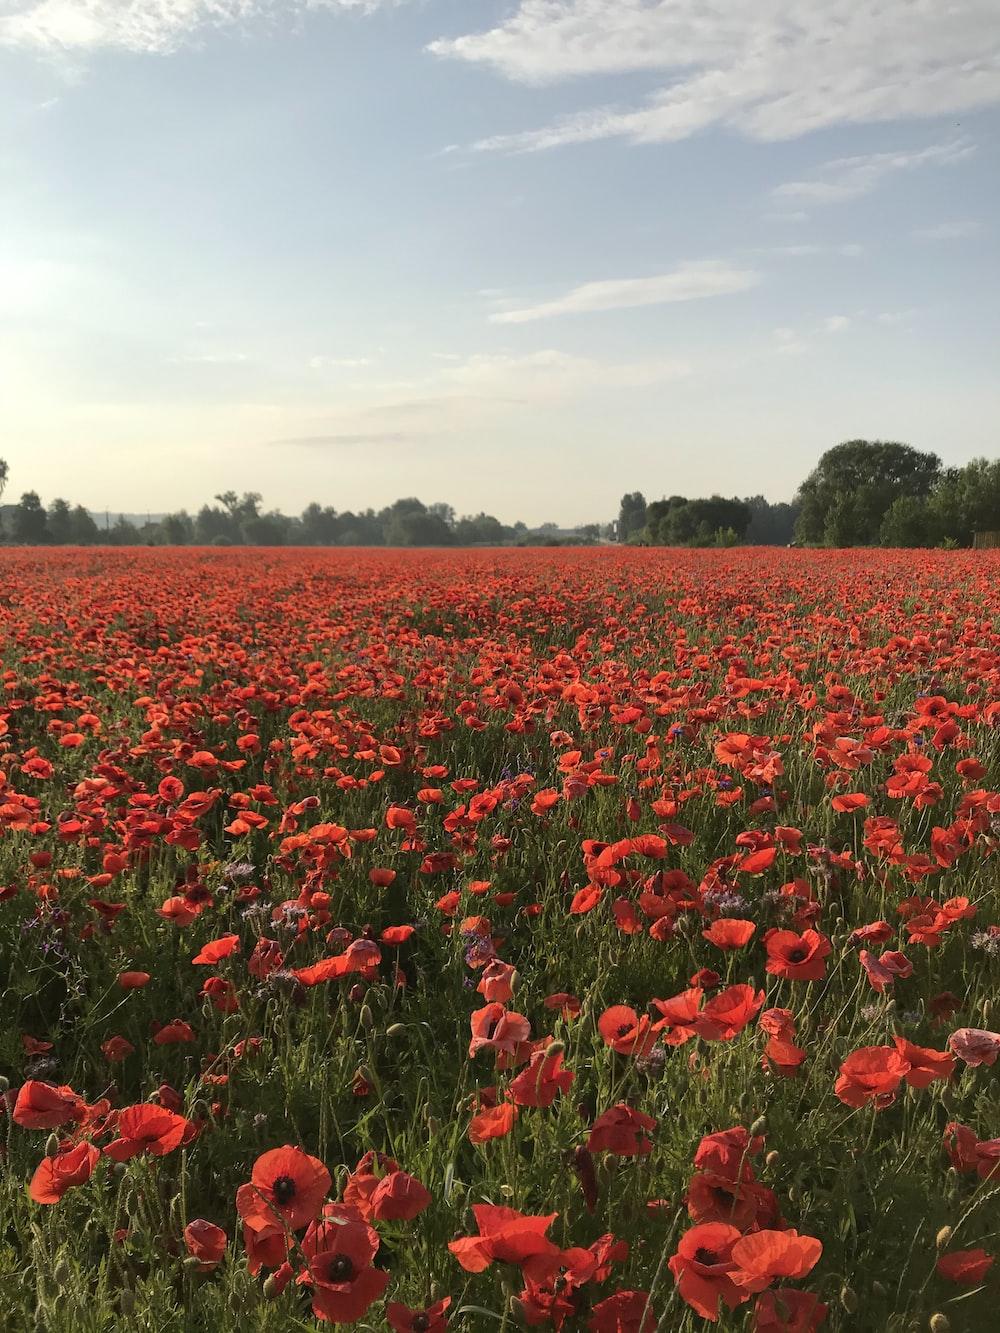 red flower field during daytime